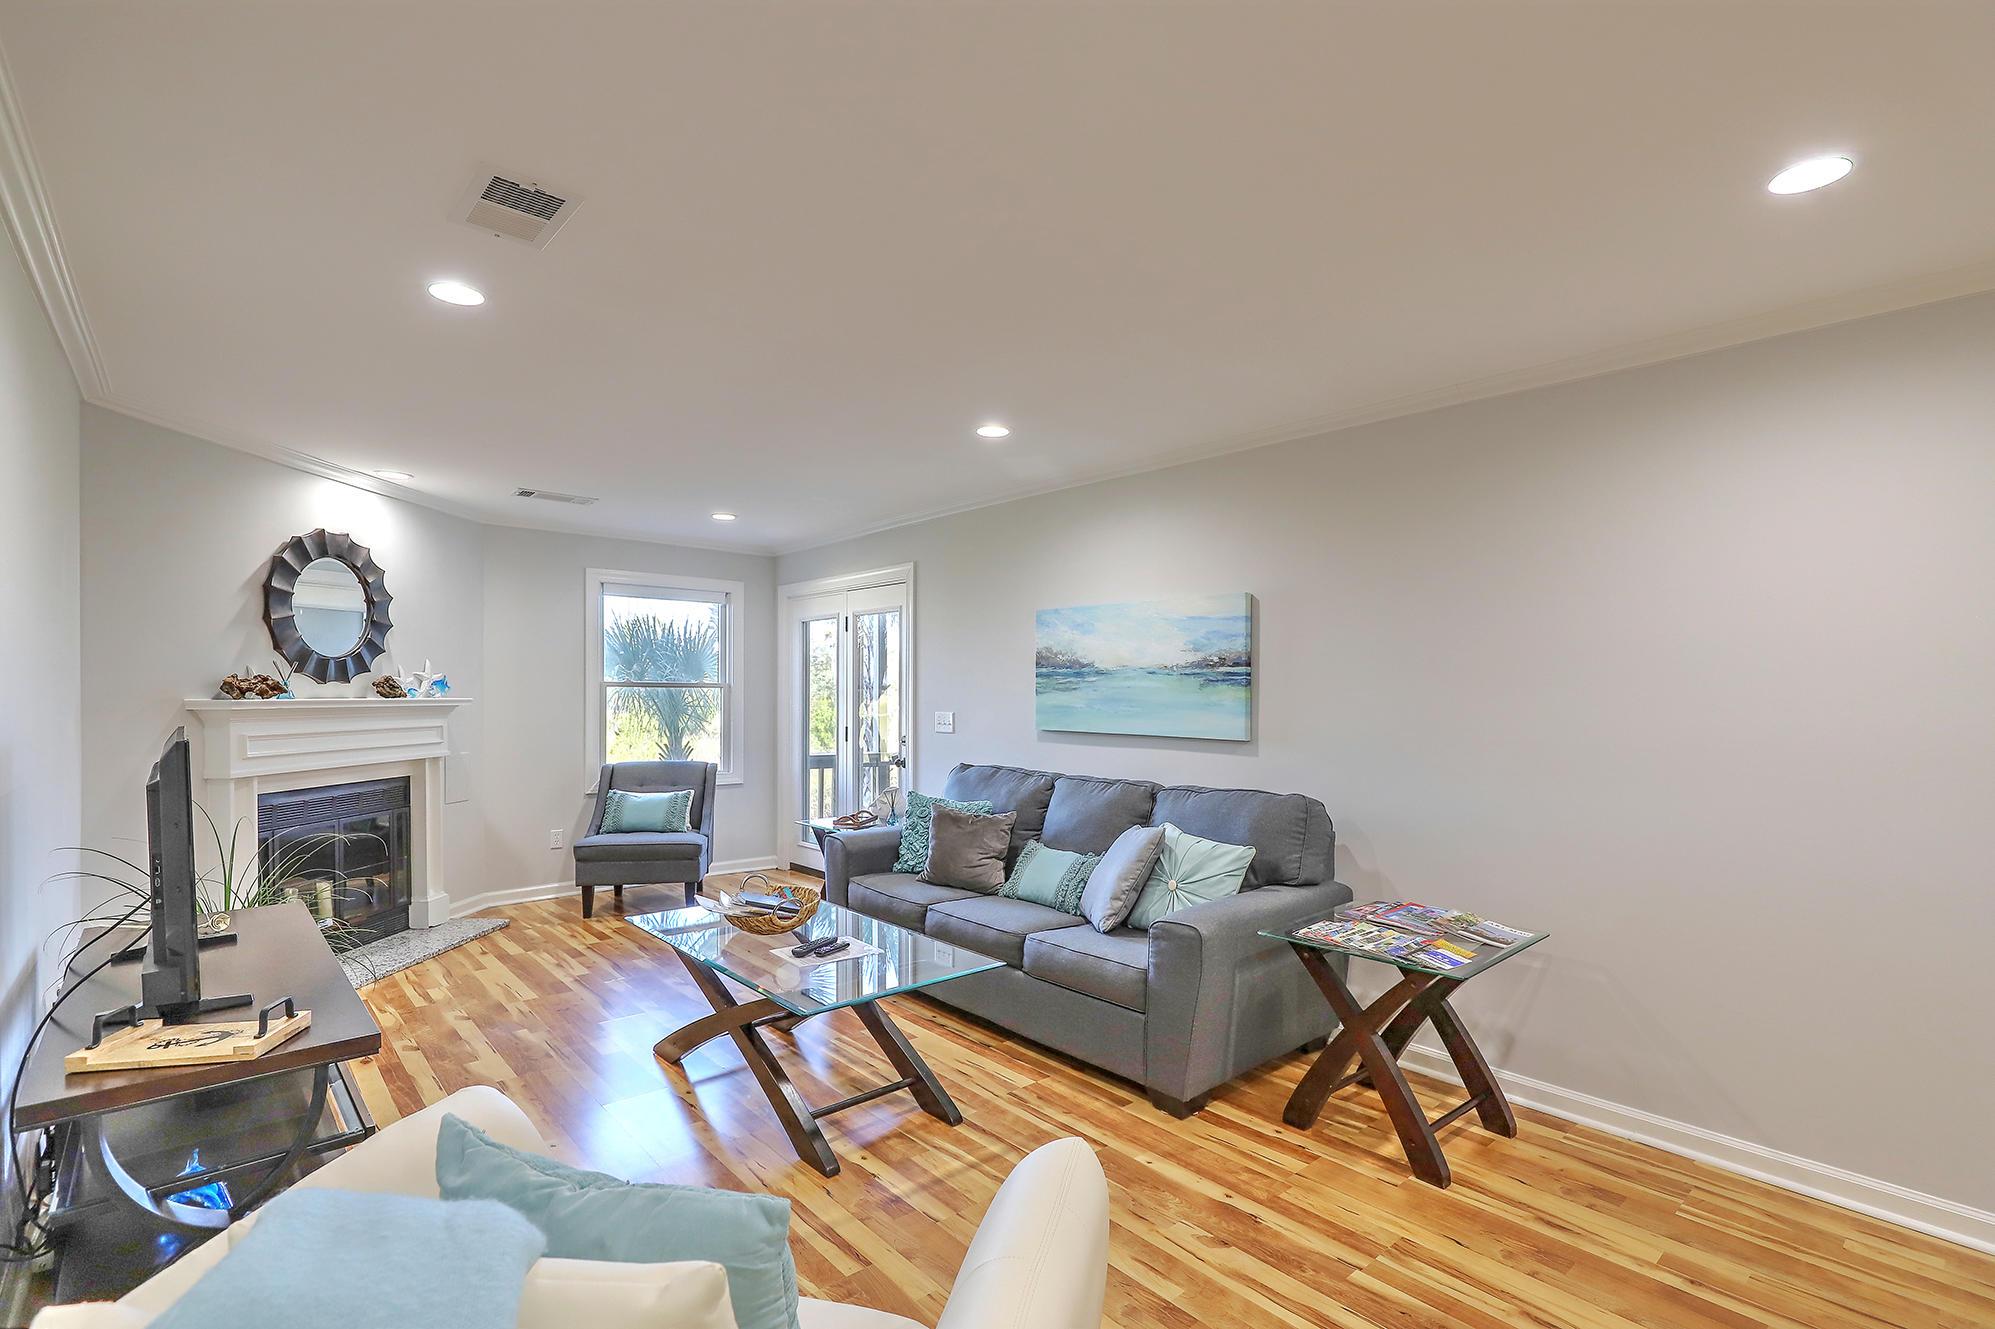 Seabrook Island Homes For Sale - 2103 Landfall, Johns Island, SC - 16